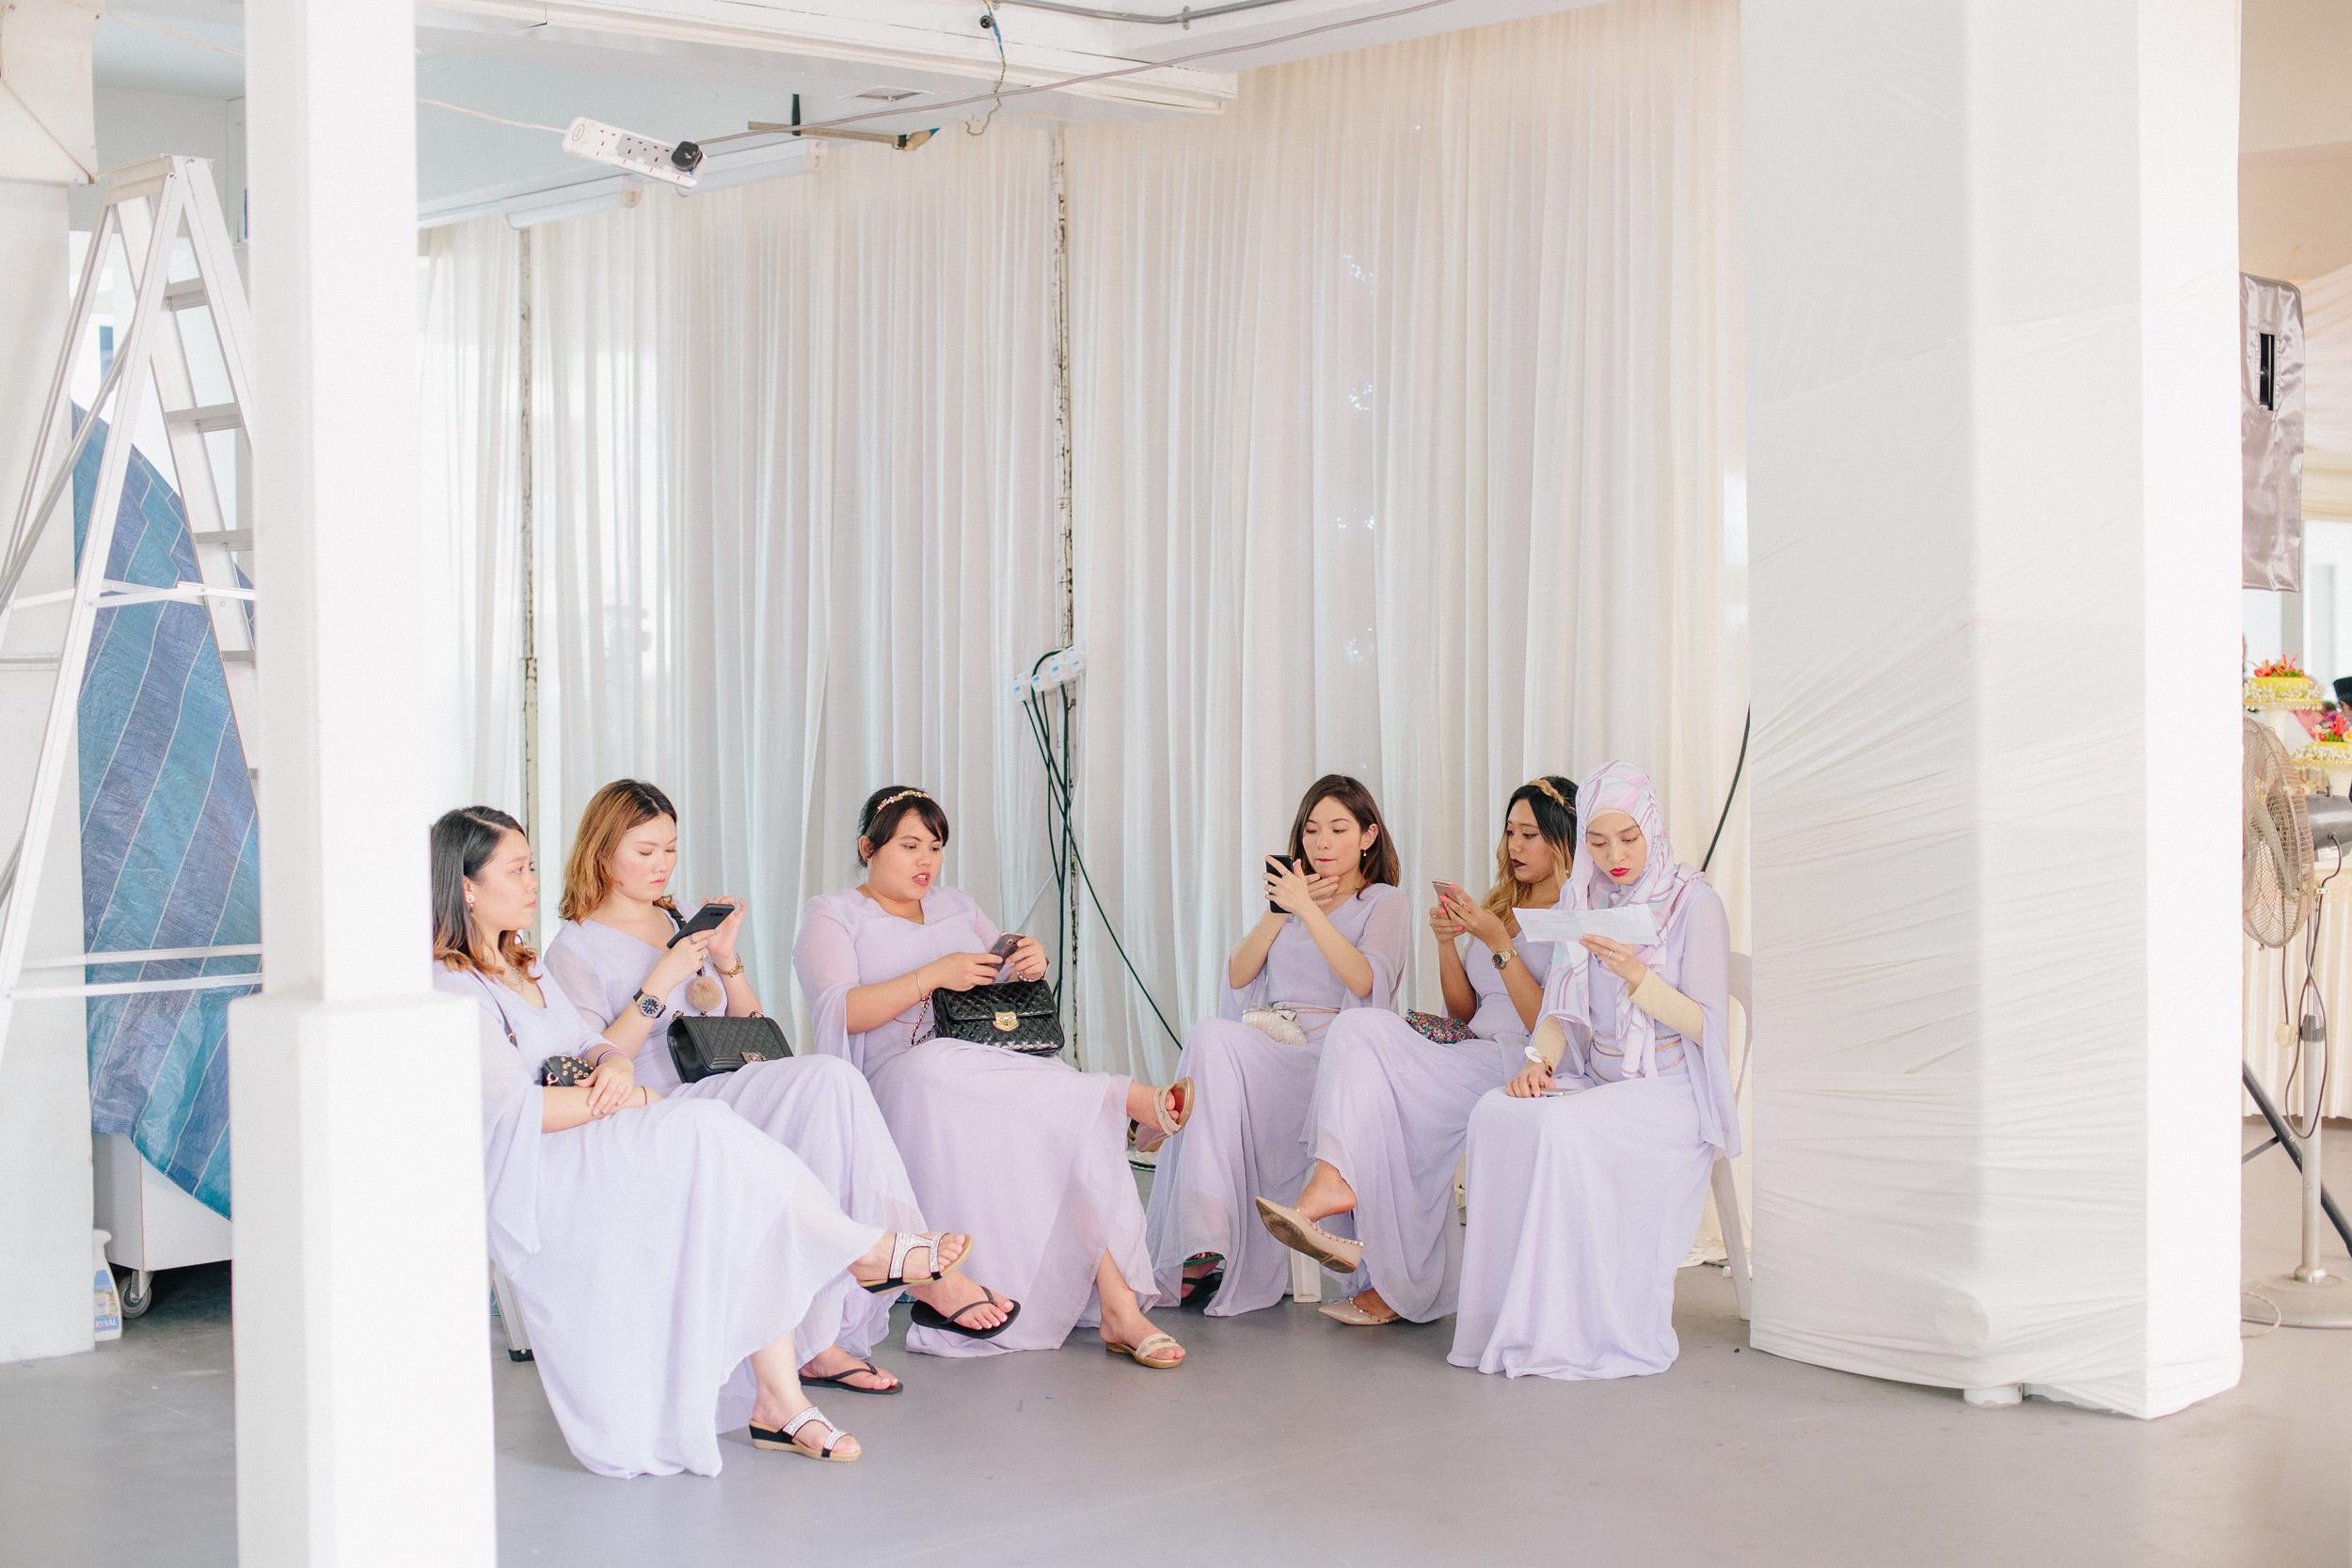 singapore-wedding-photographer-photography-wmt2017-075.jpg